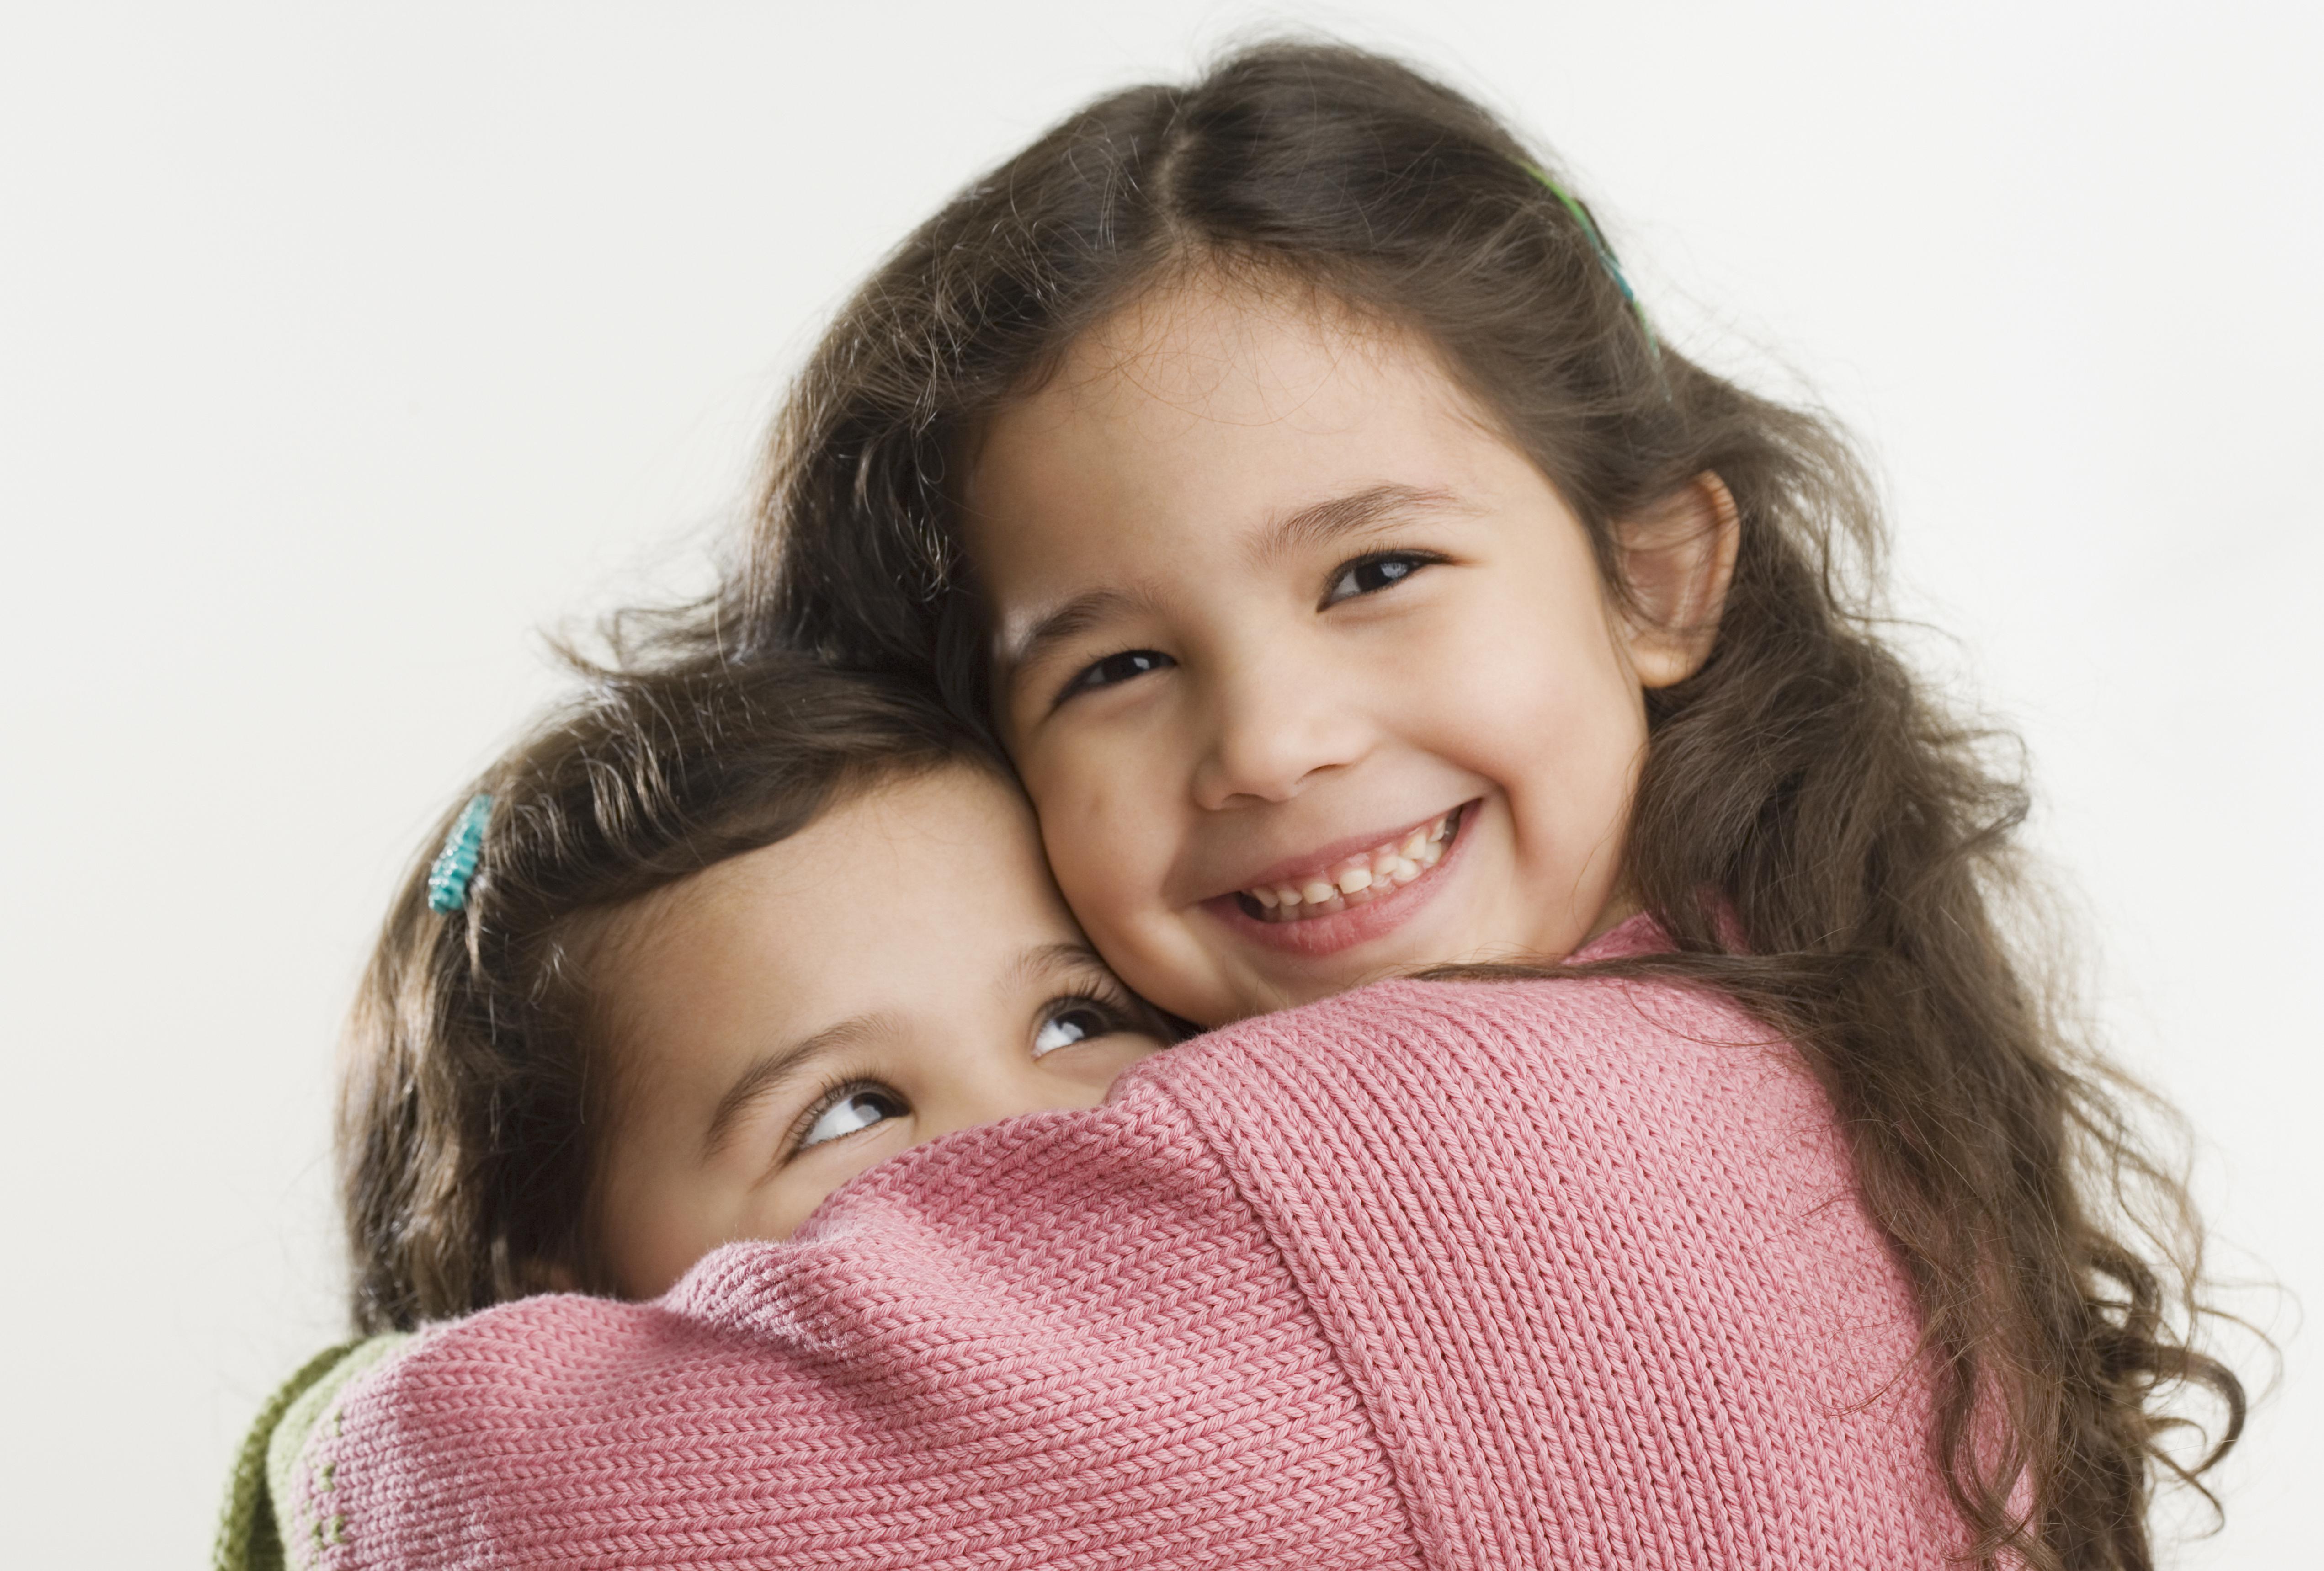 Studio shot of young Hispanic sisters hugging